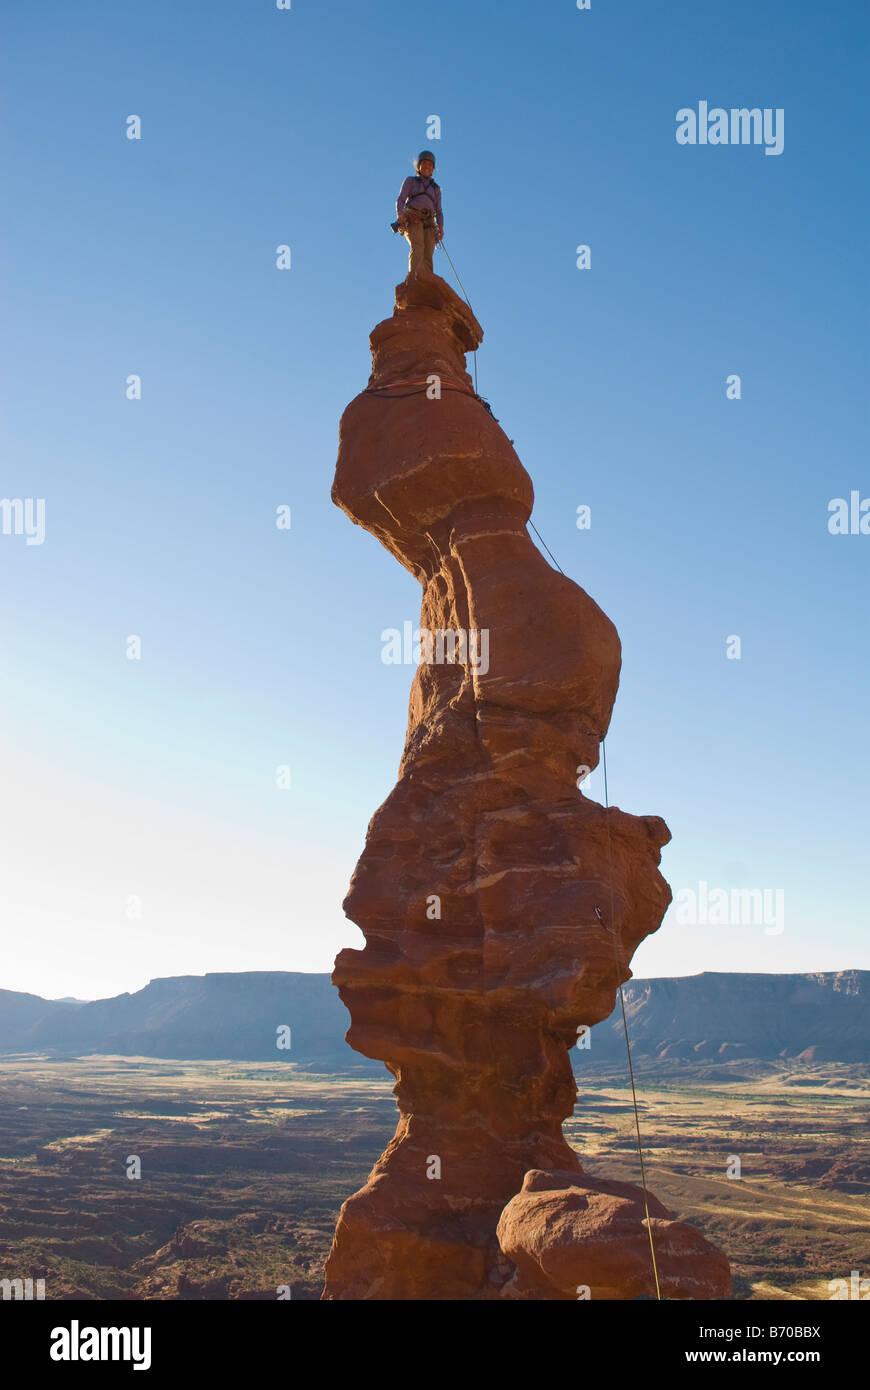 Woman of top of sandstone spire, Fisher Towers, Utah. - Stock Image